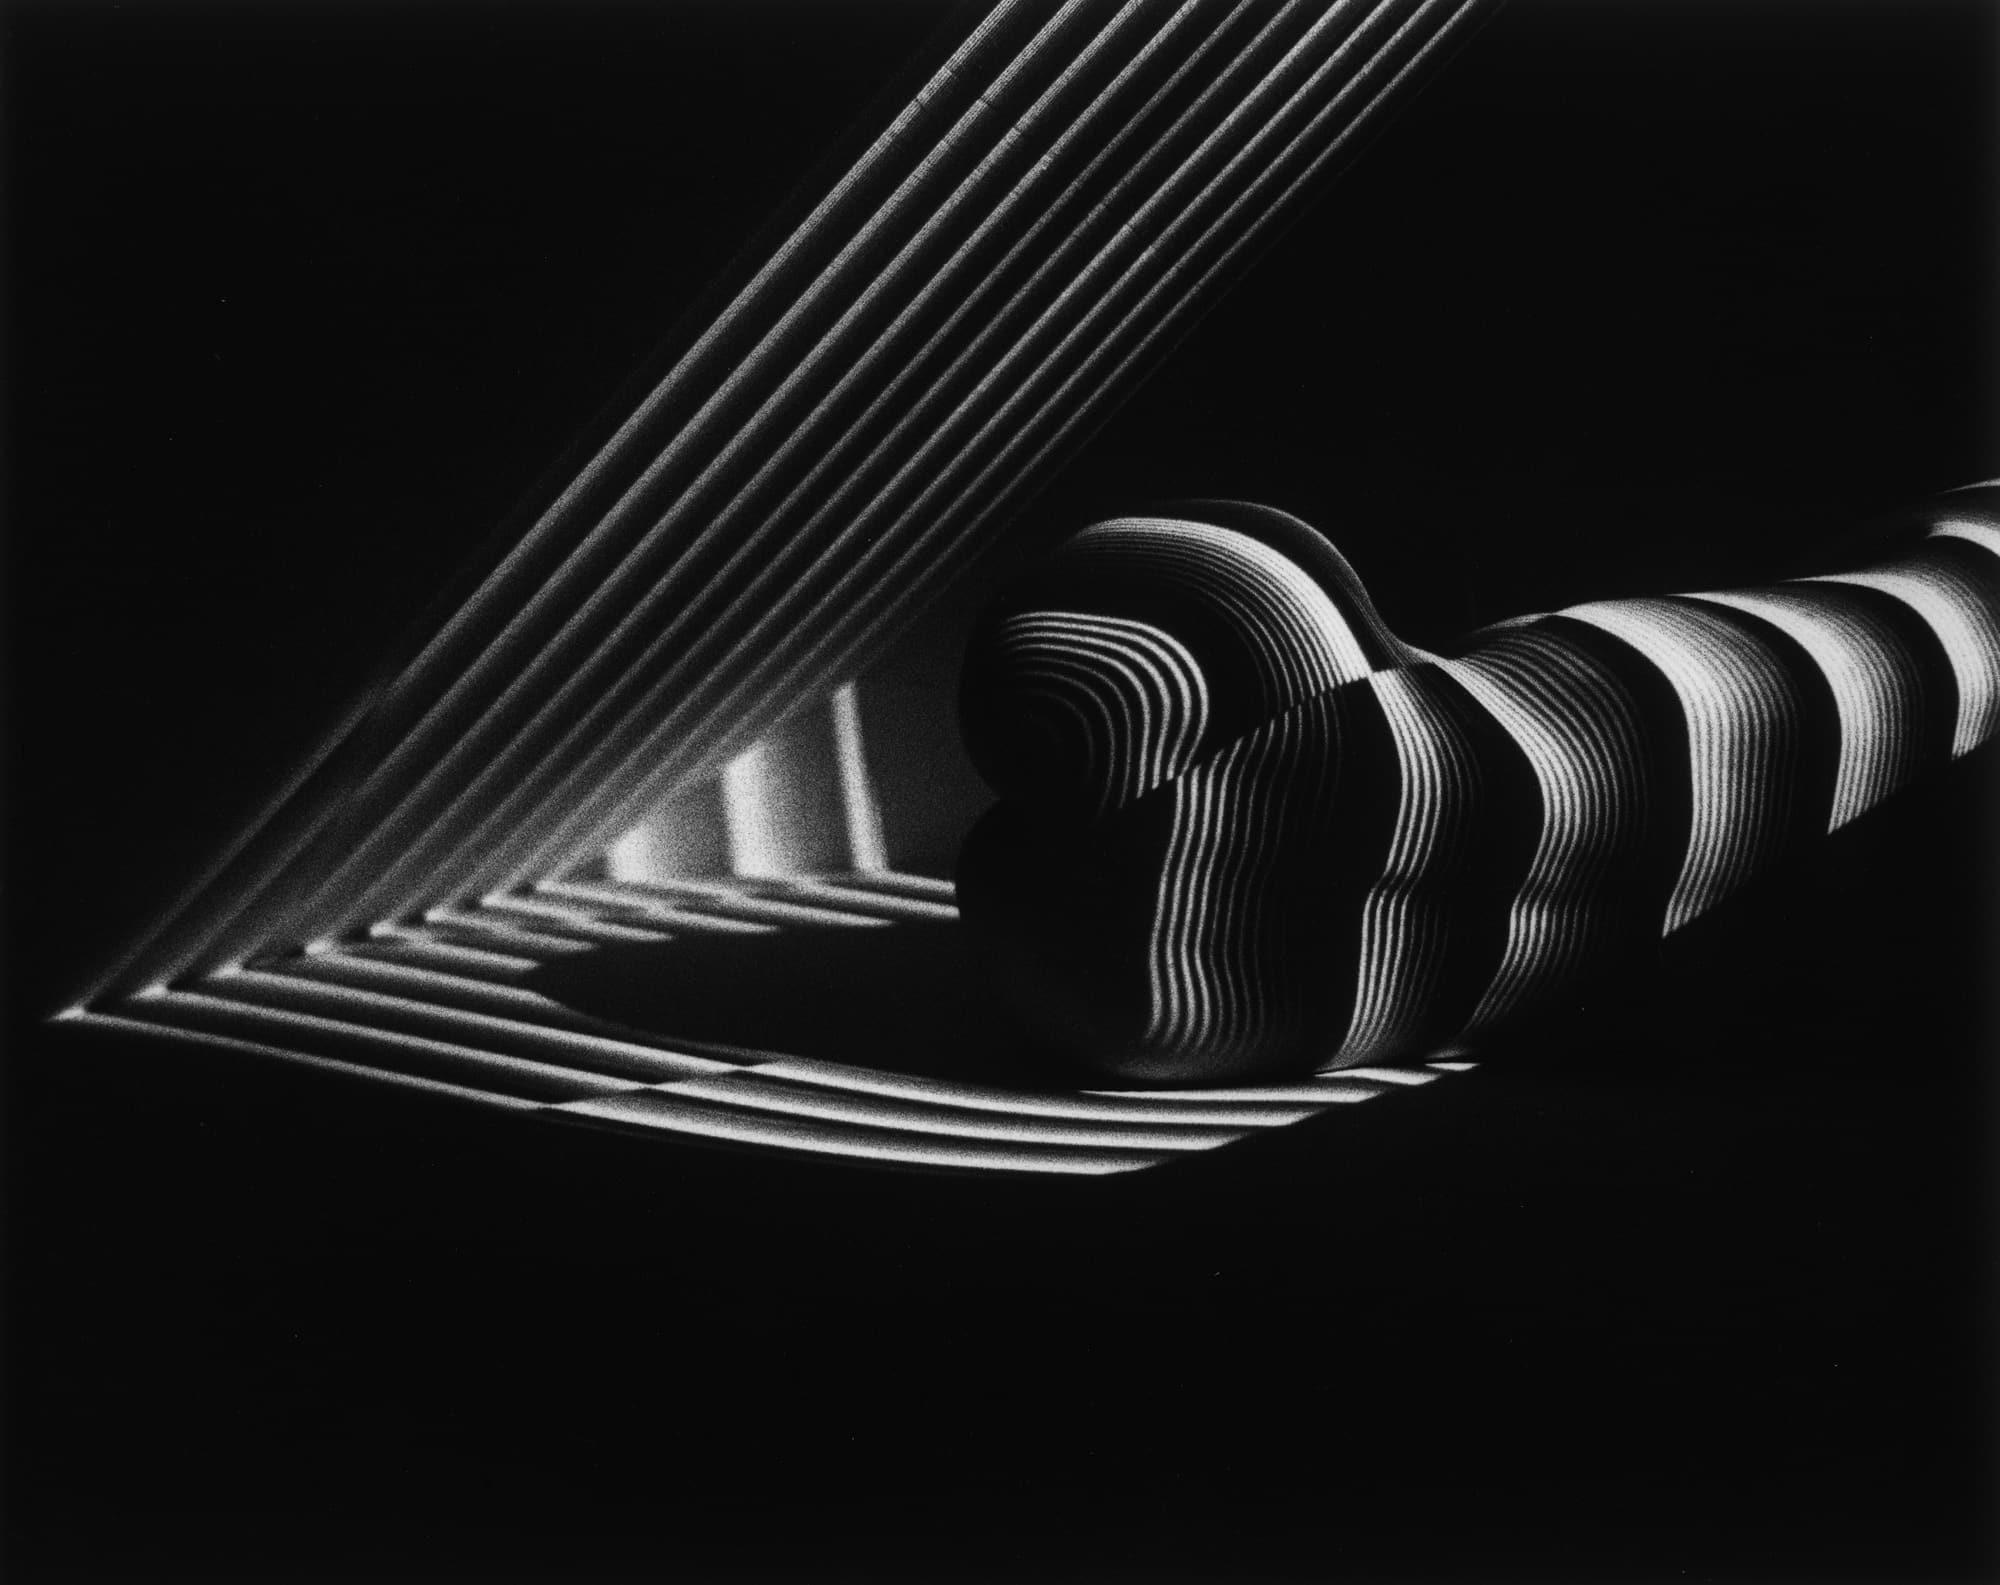 Optics 檻 1969